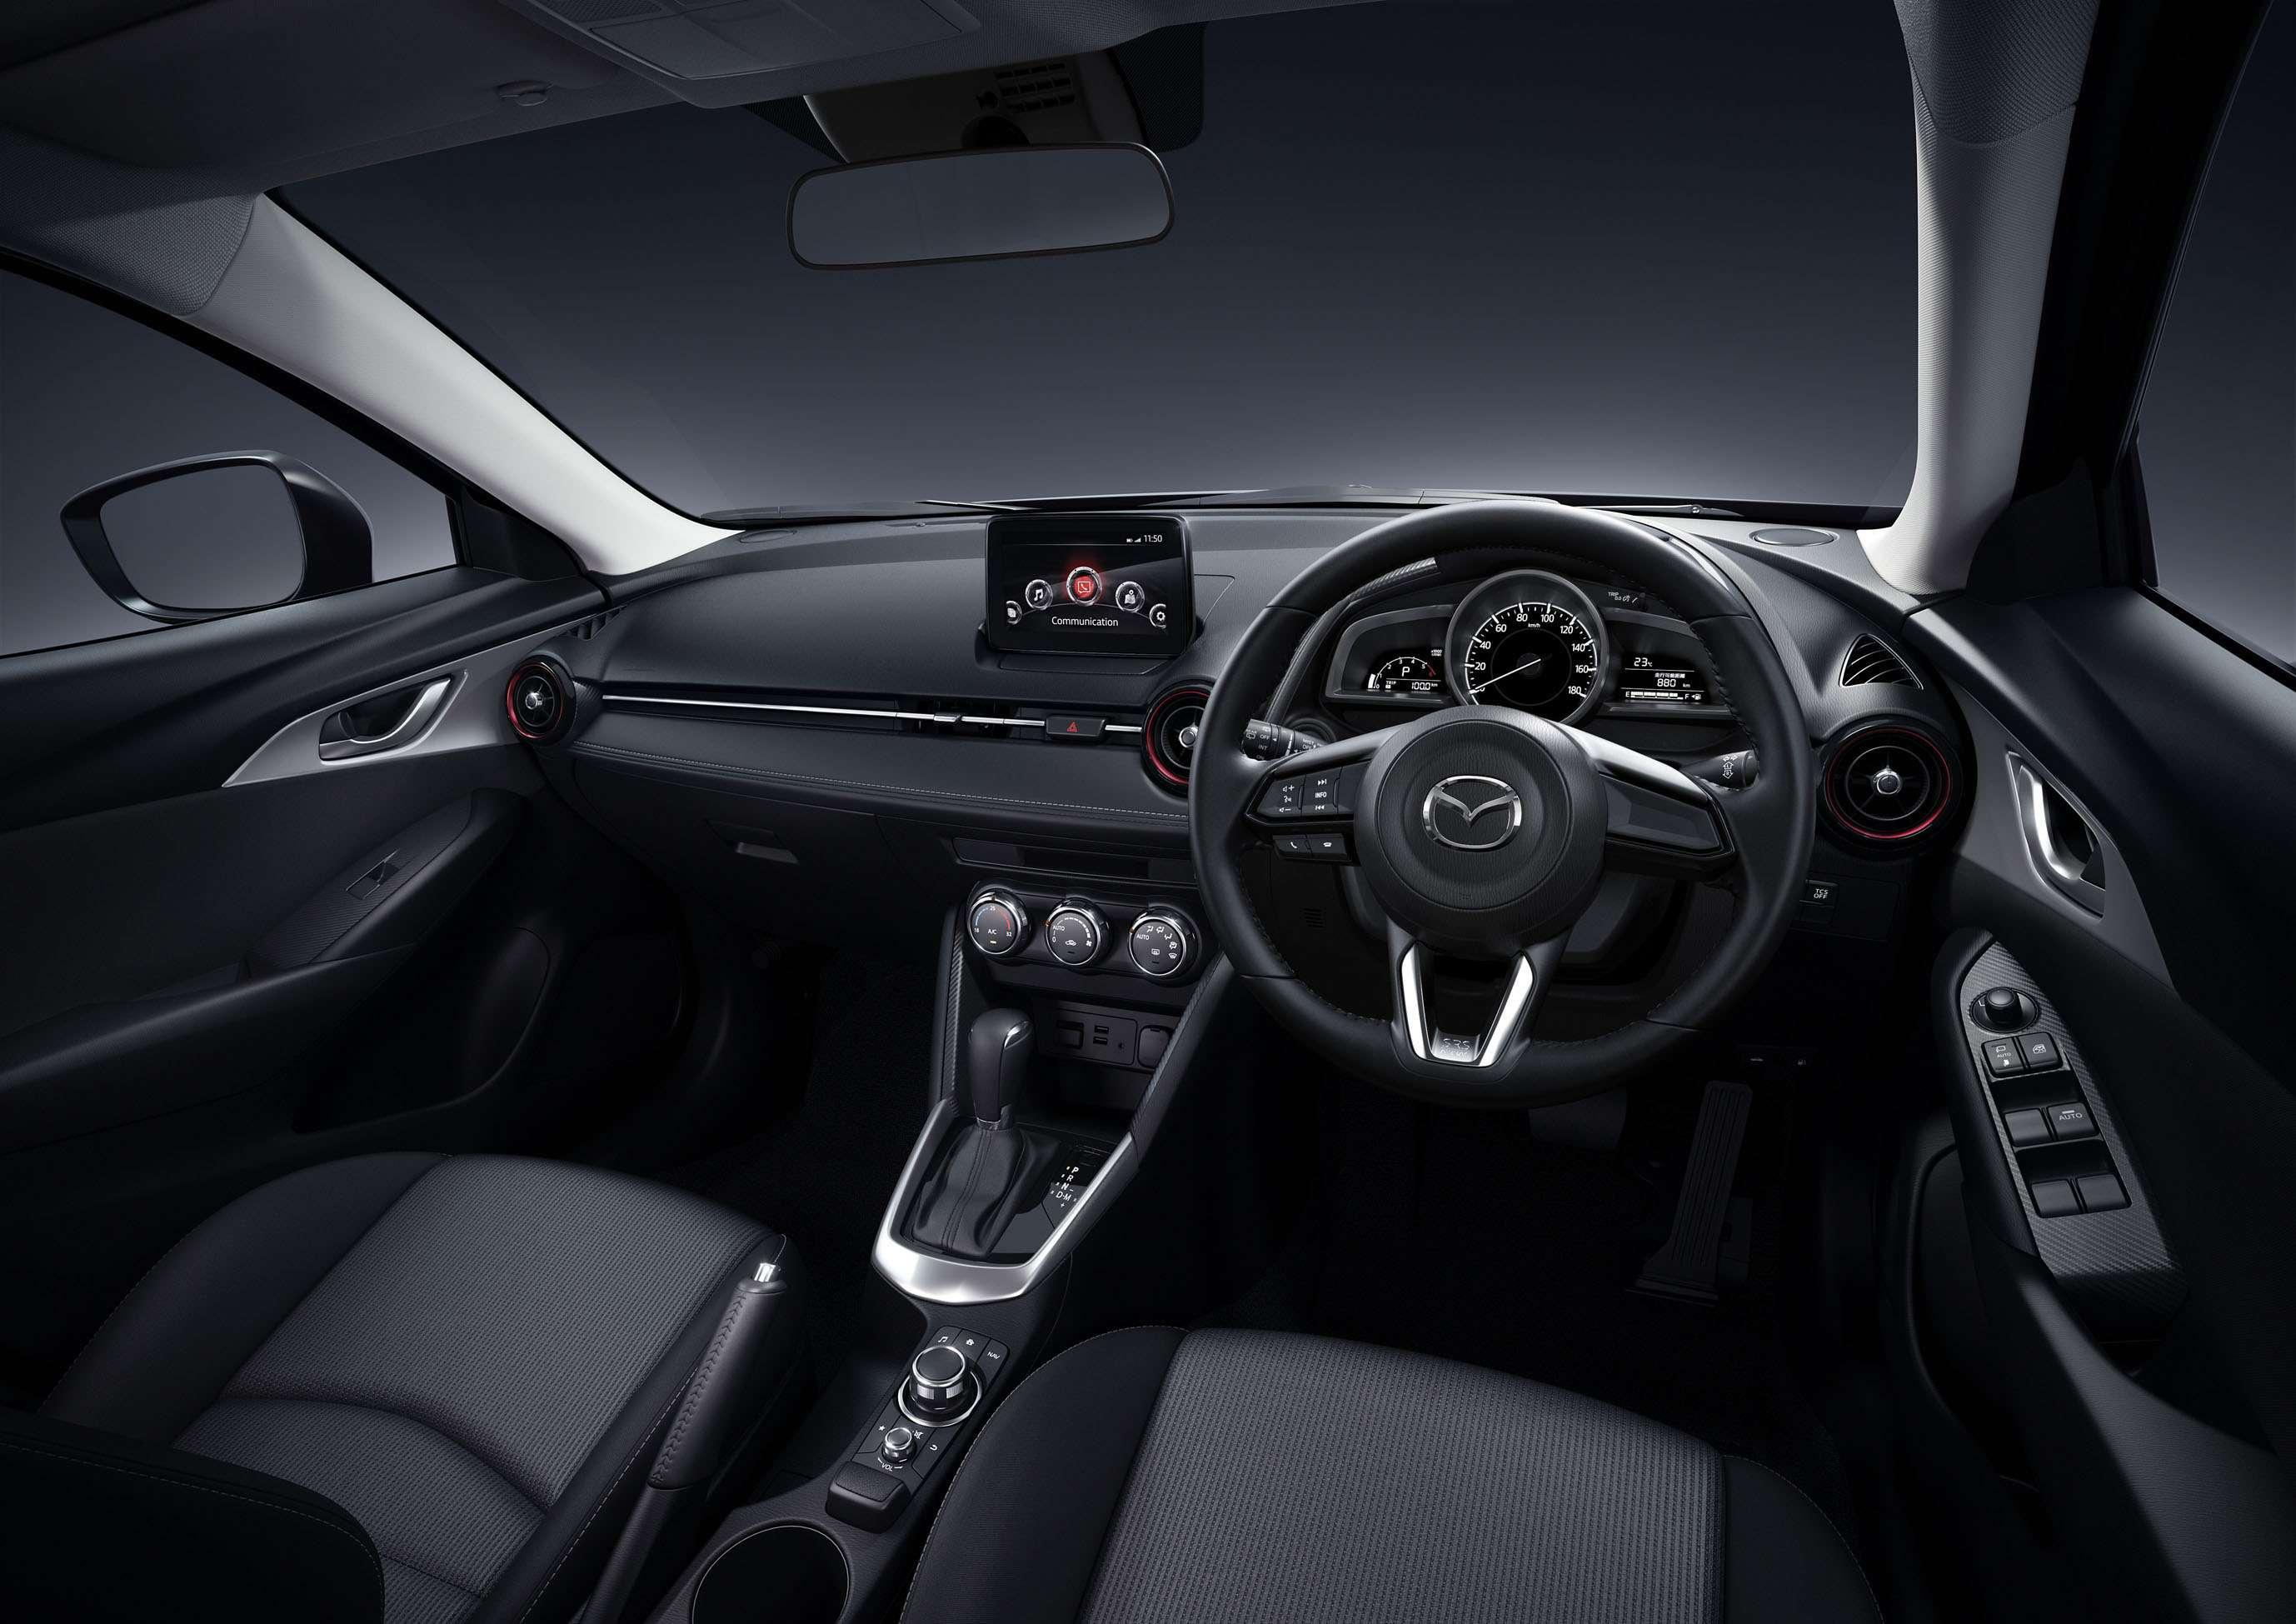 Японские штучки: Mazda CX-3и Demio срочно обновились— фото 650004